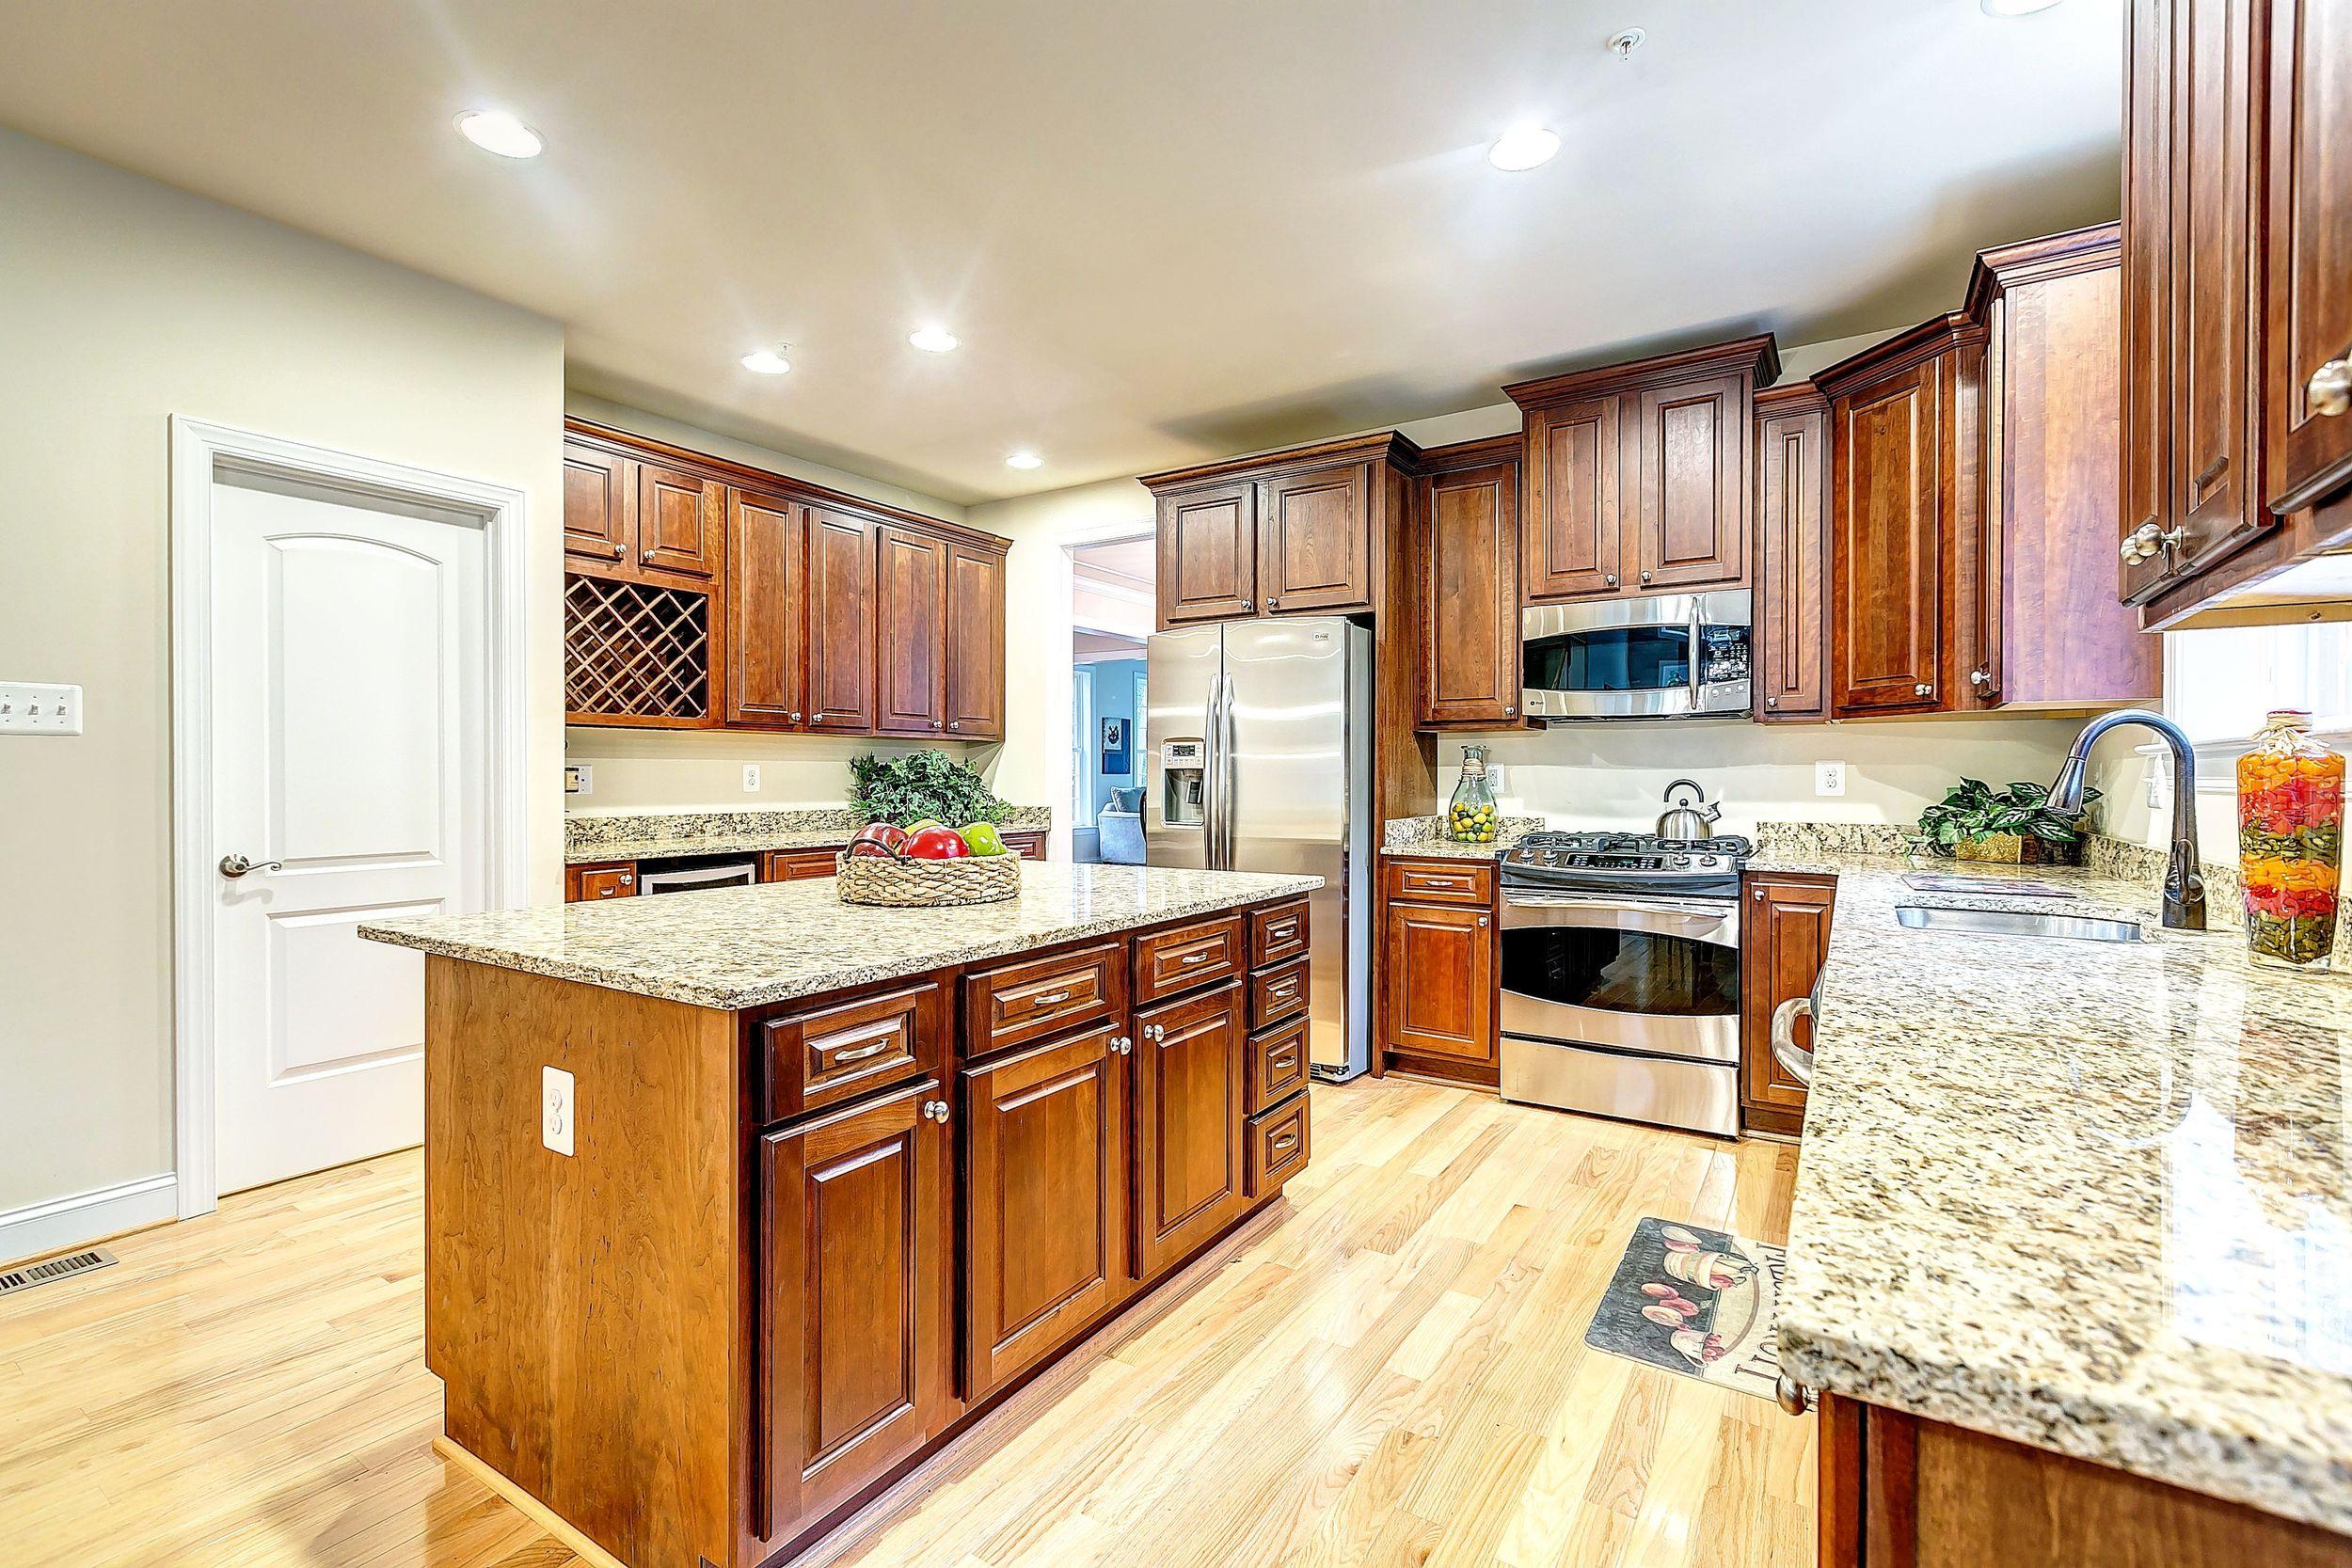 rylea-homes-custom-home-15.jpg